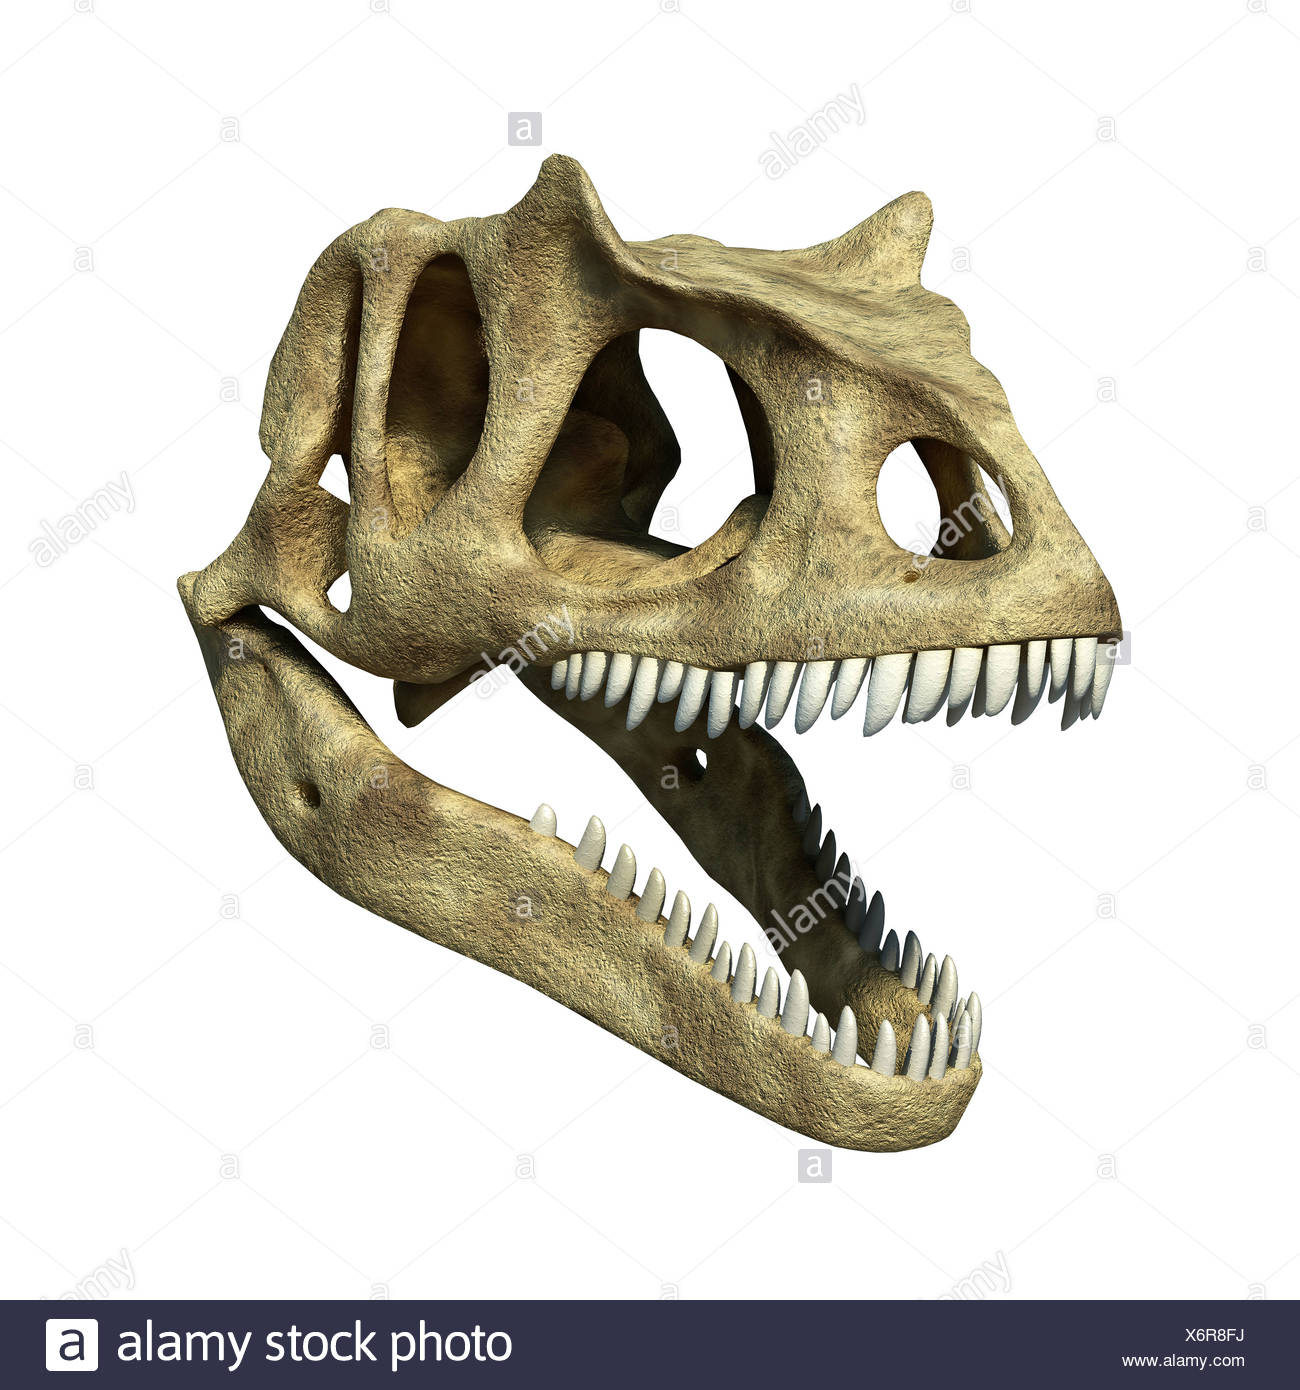 Allosaurus dinosaur skull Allosaurs large carnivorous reptiles late Jurassic period 155 to 145 million years ago bipedal - Stock Image